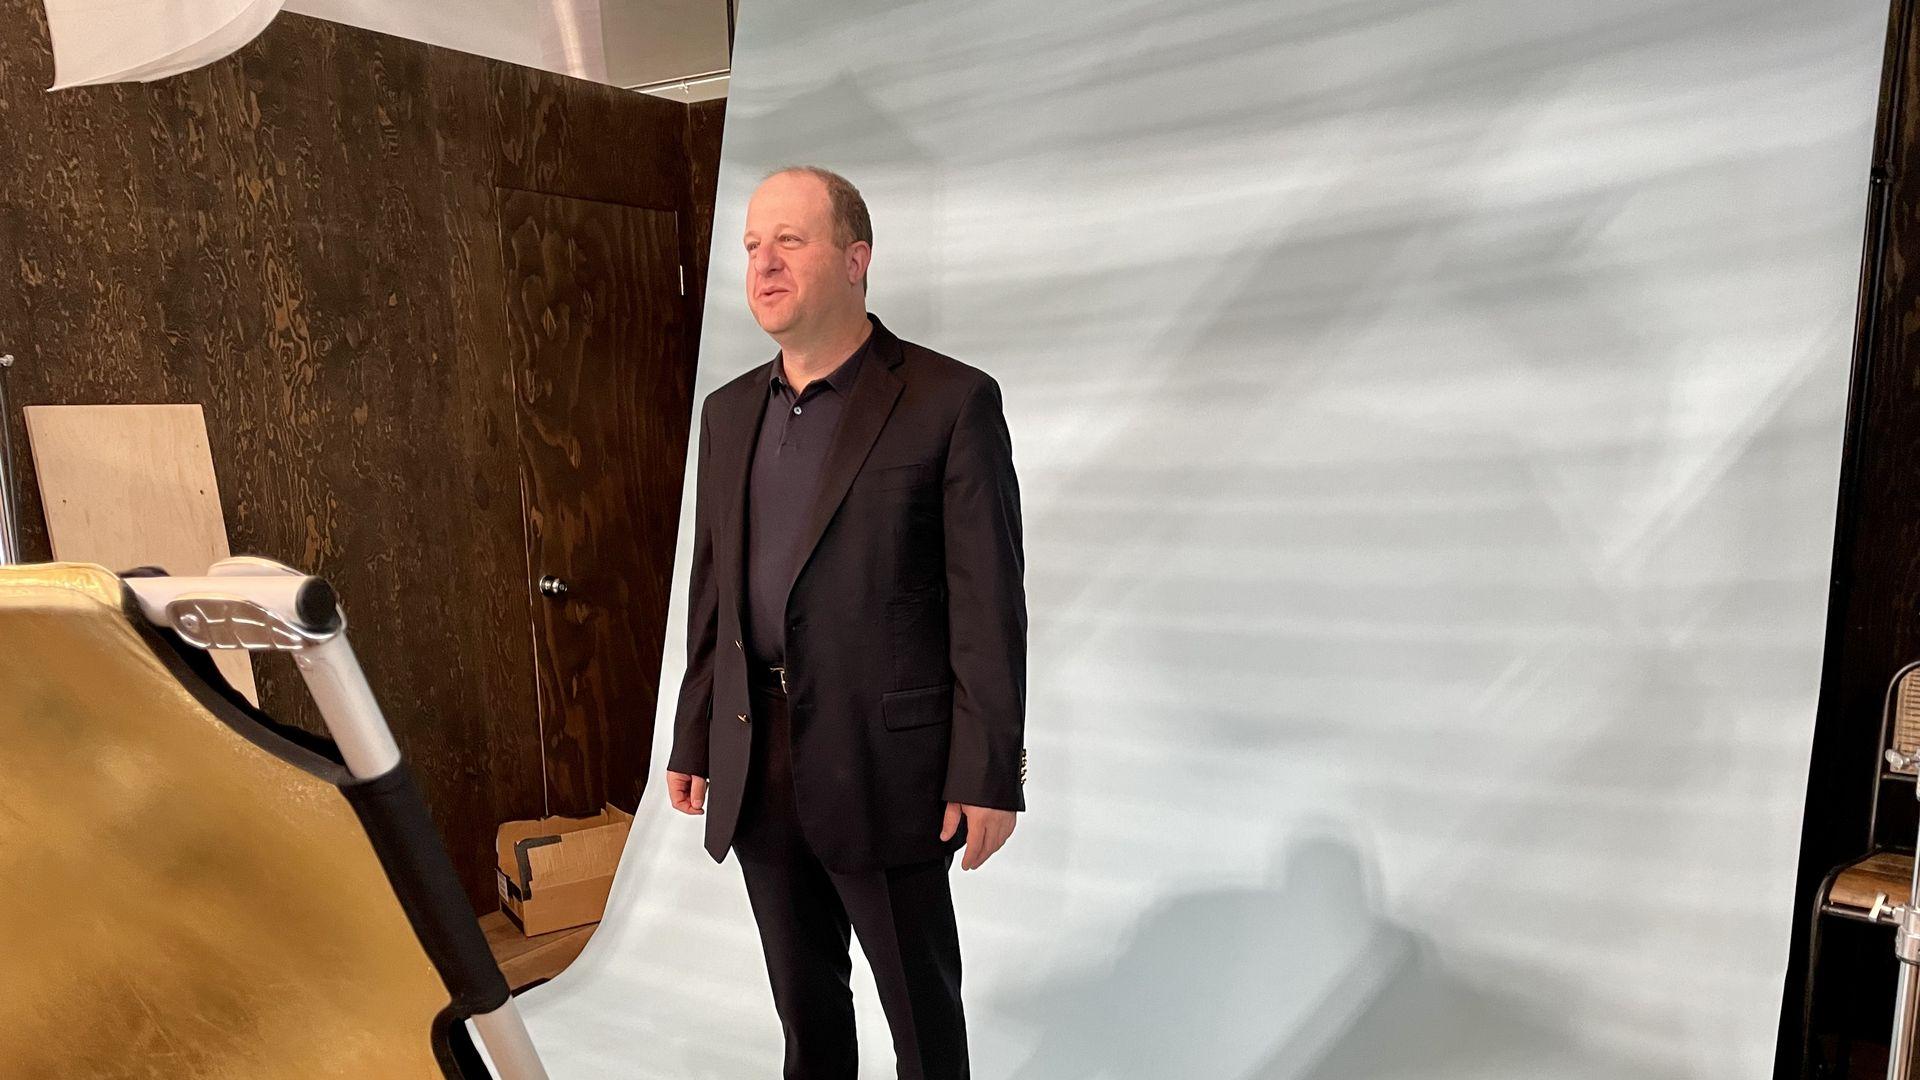 Gov. Jared Polis poses for a photo at the 2021 Outdoor Retailer show in Denver. Photo: John Frank/Axios